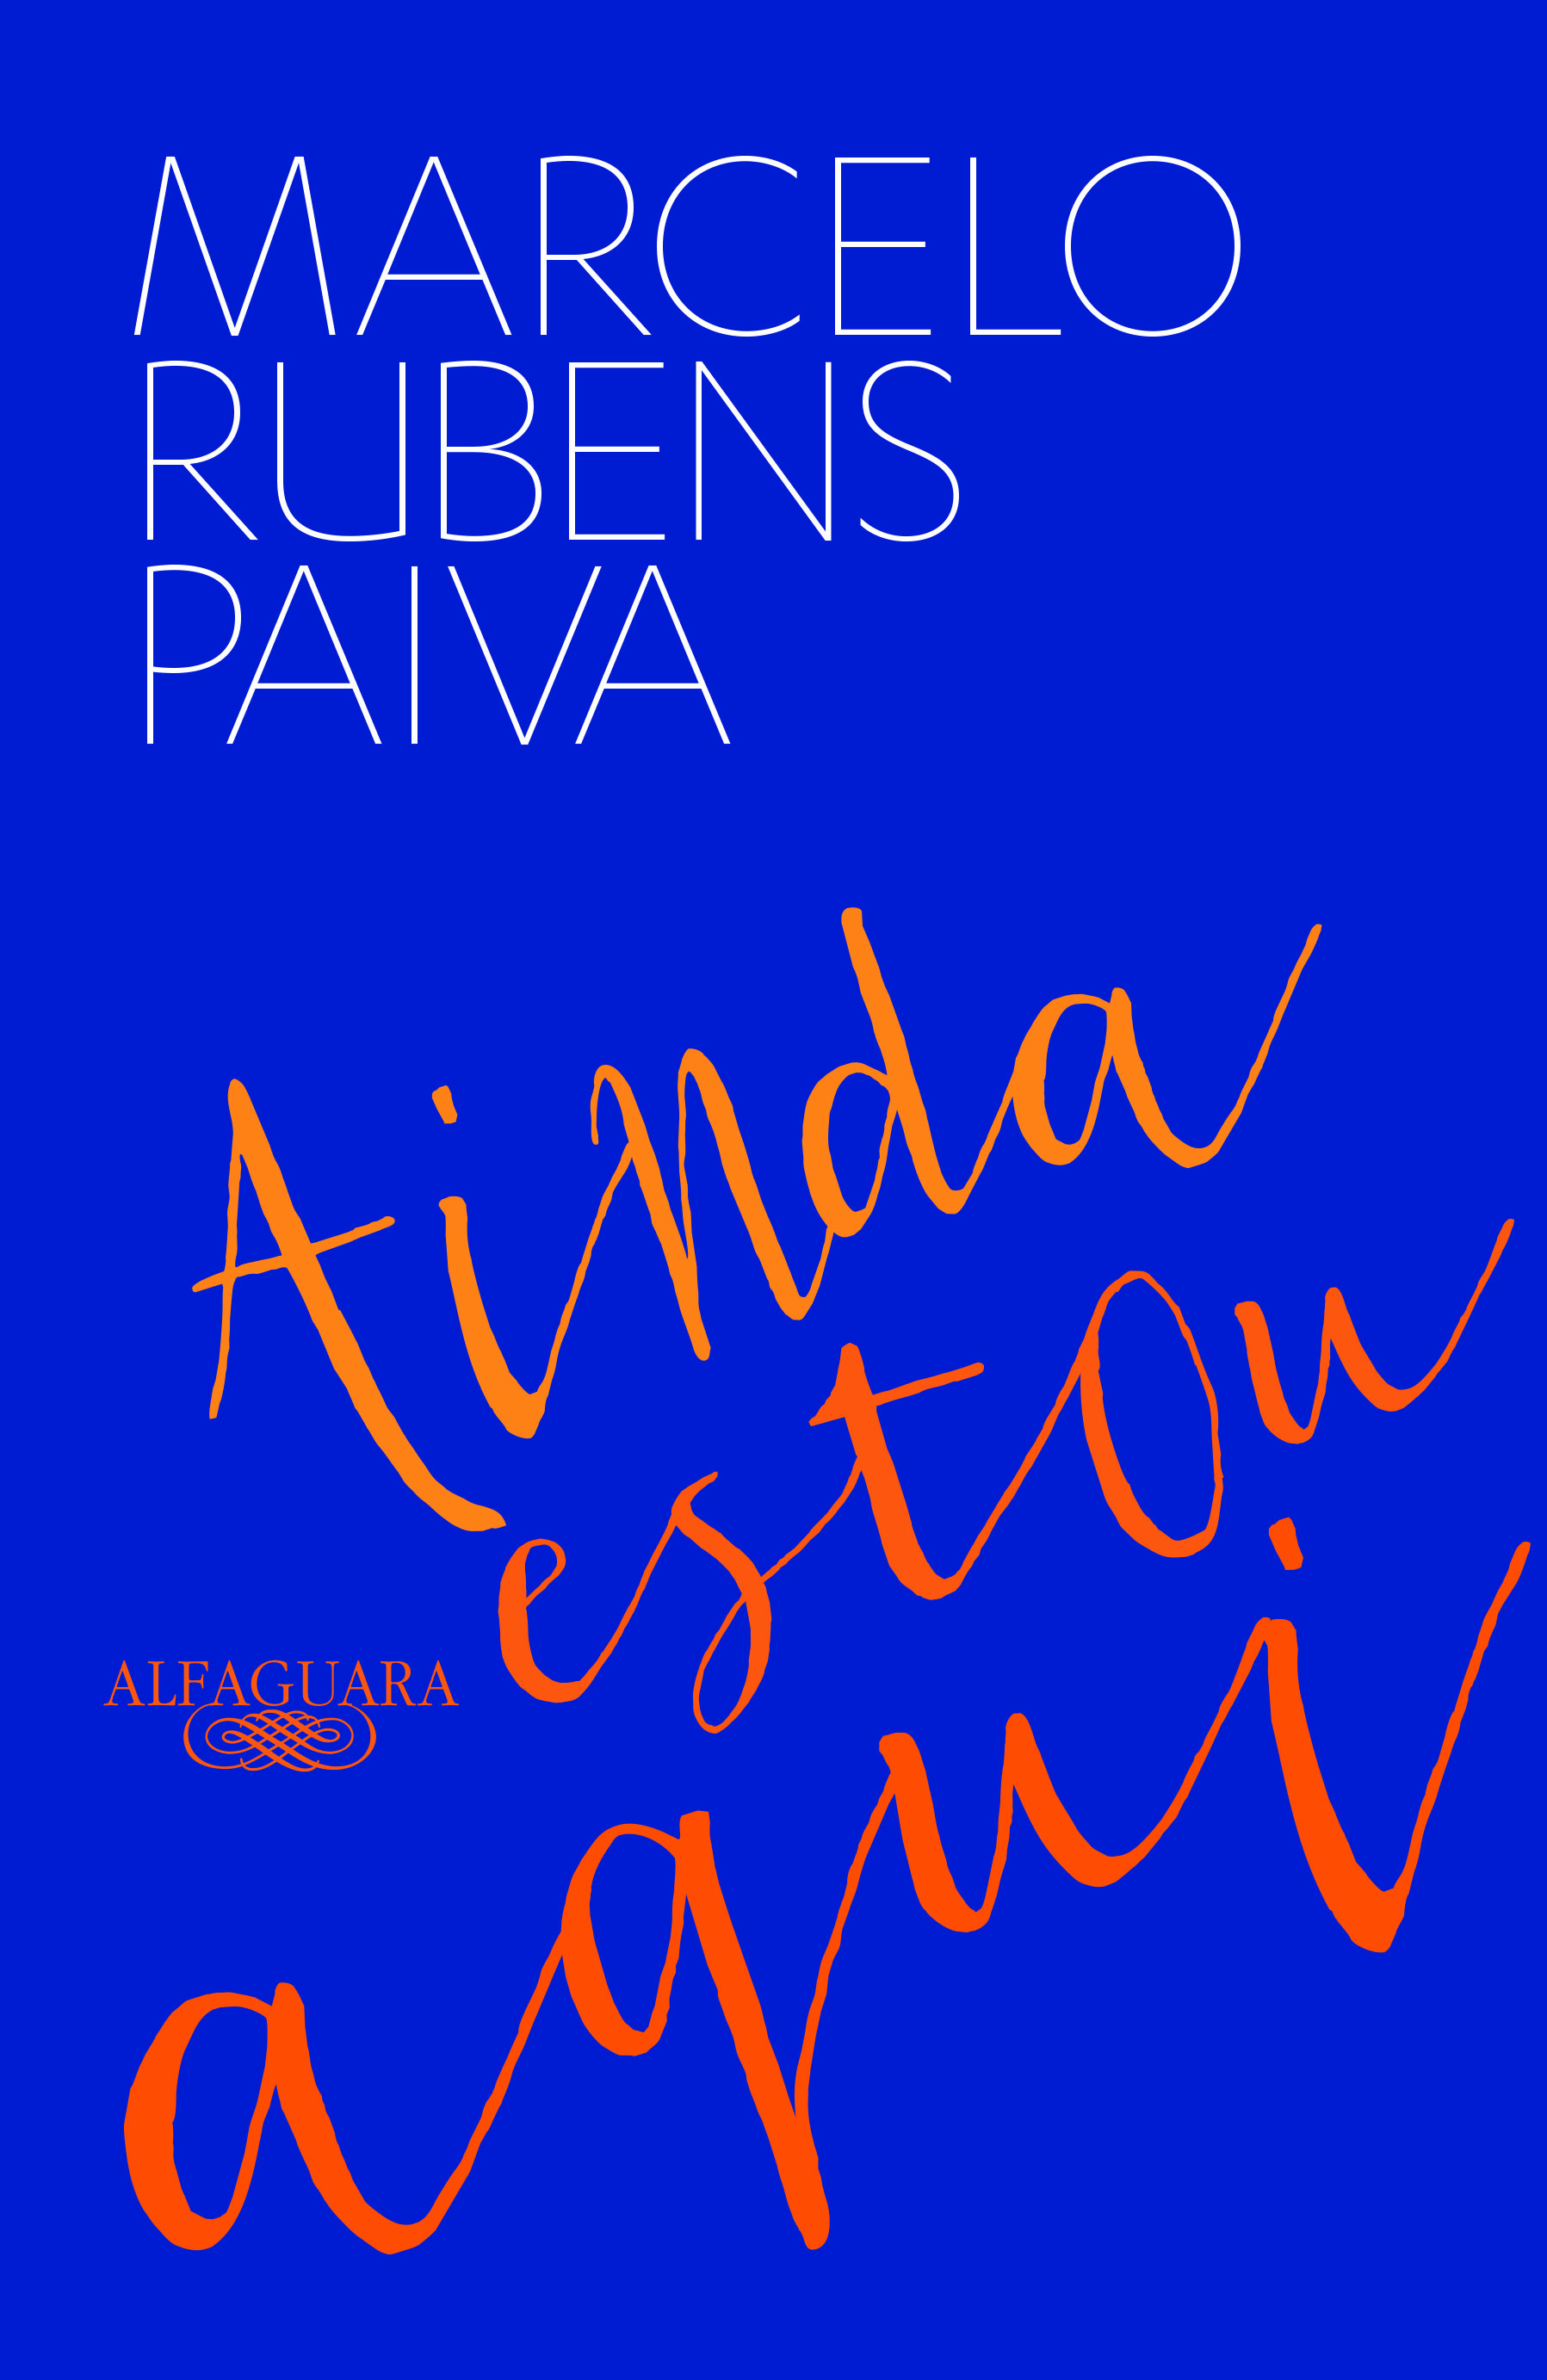 Ainda estou aqui Marcelo Rubens Paiva